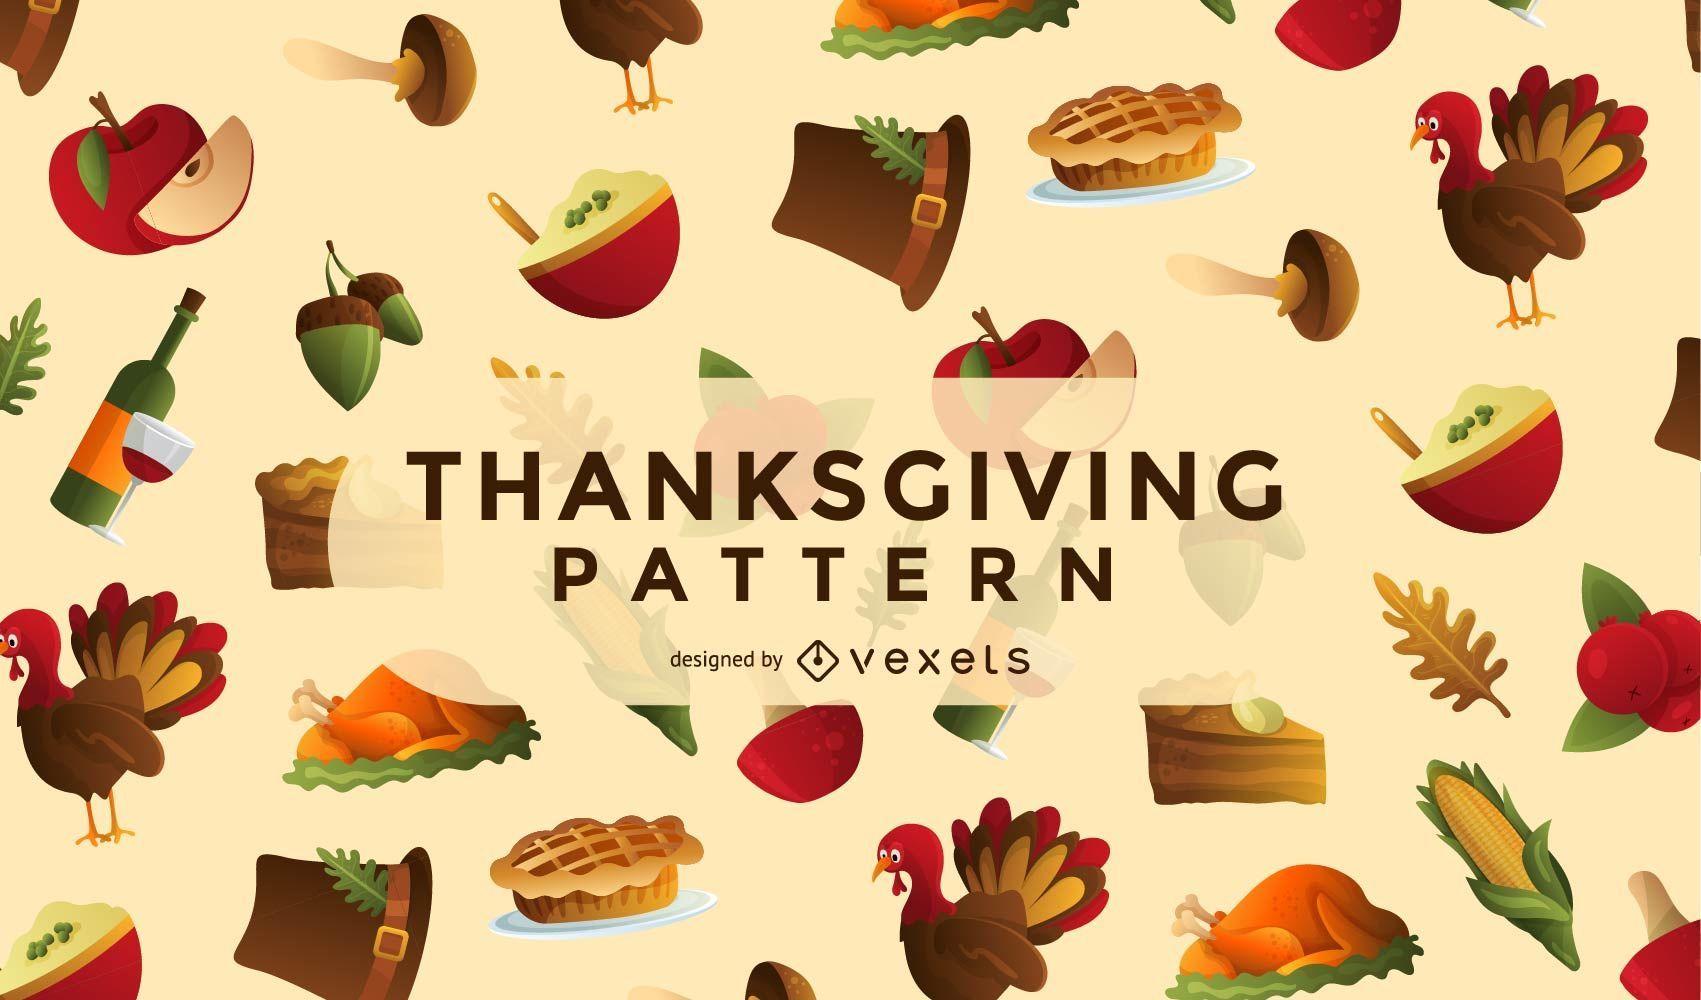 Thanksgiving elements pattern